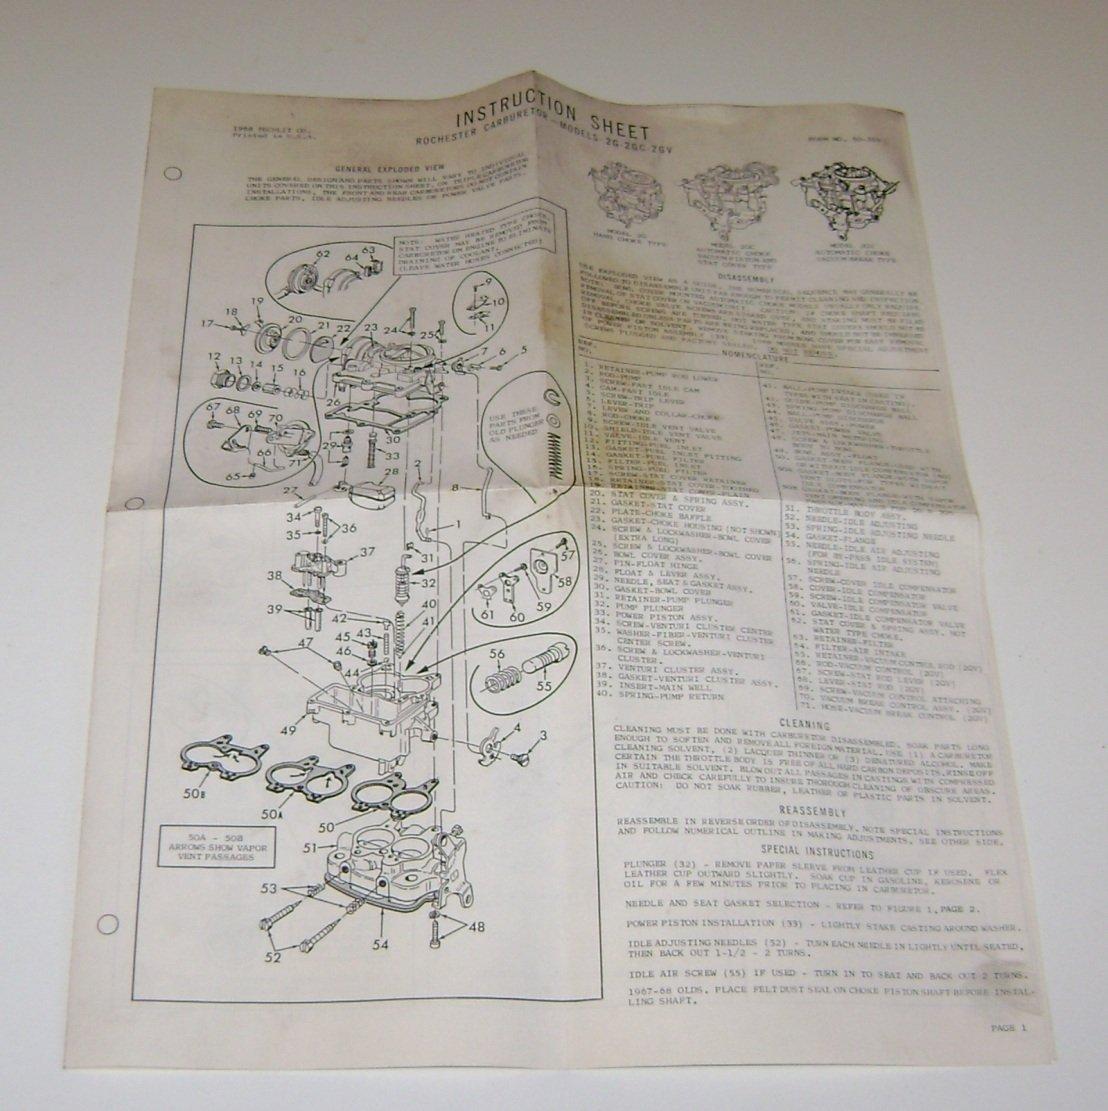 1968 Instruction sheet Rochestor Carburetor model 2G 2GC 2GV